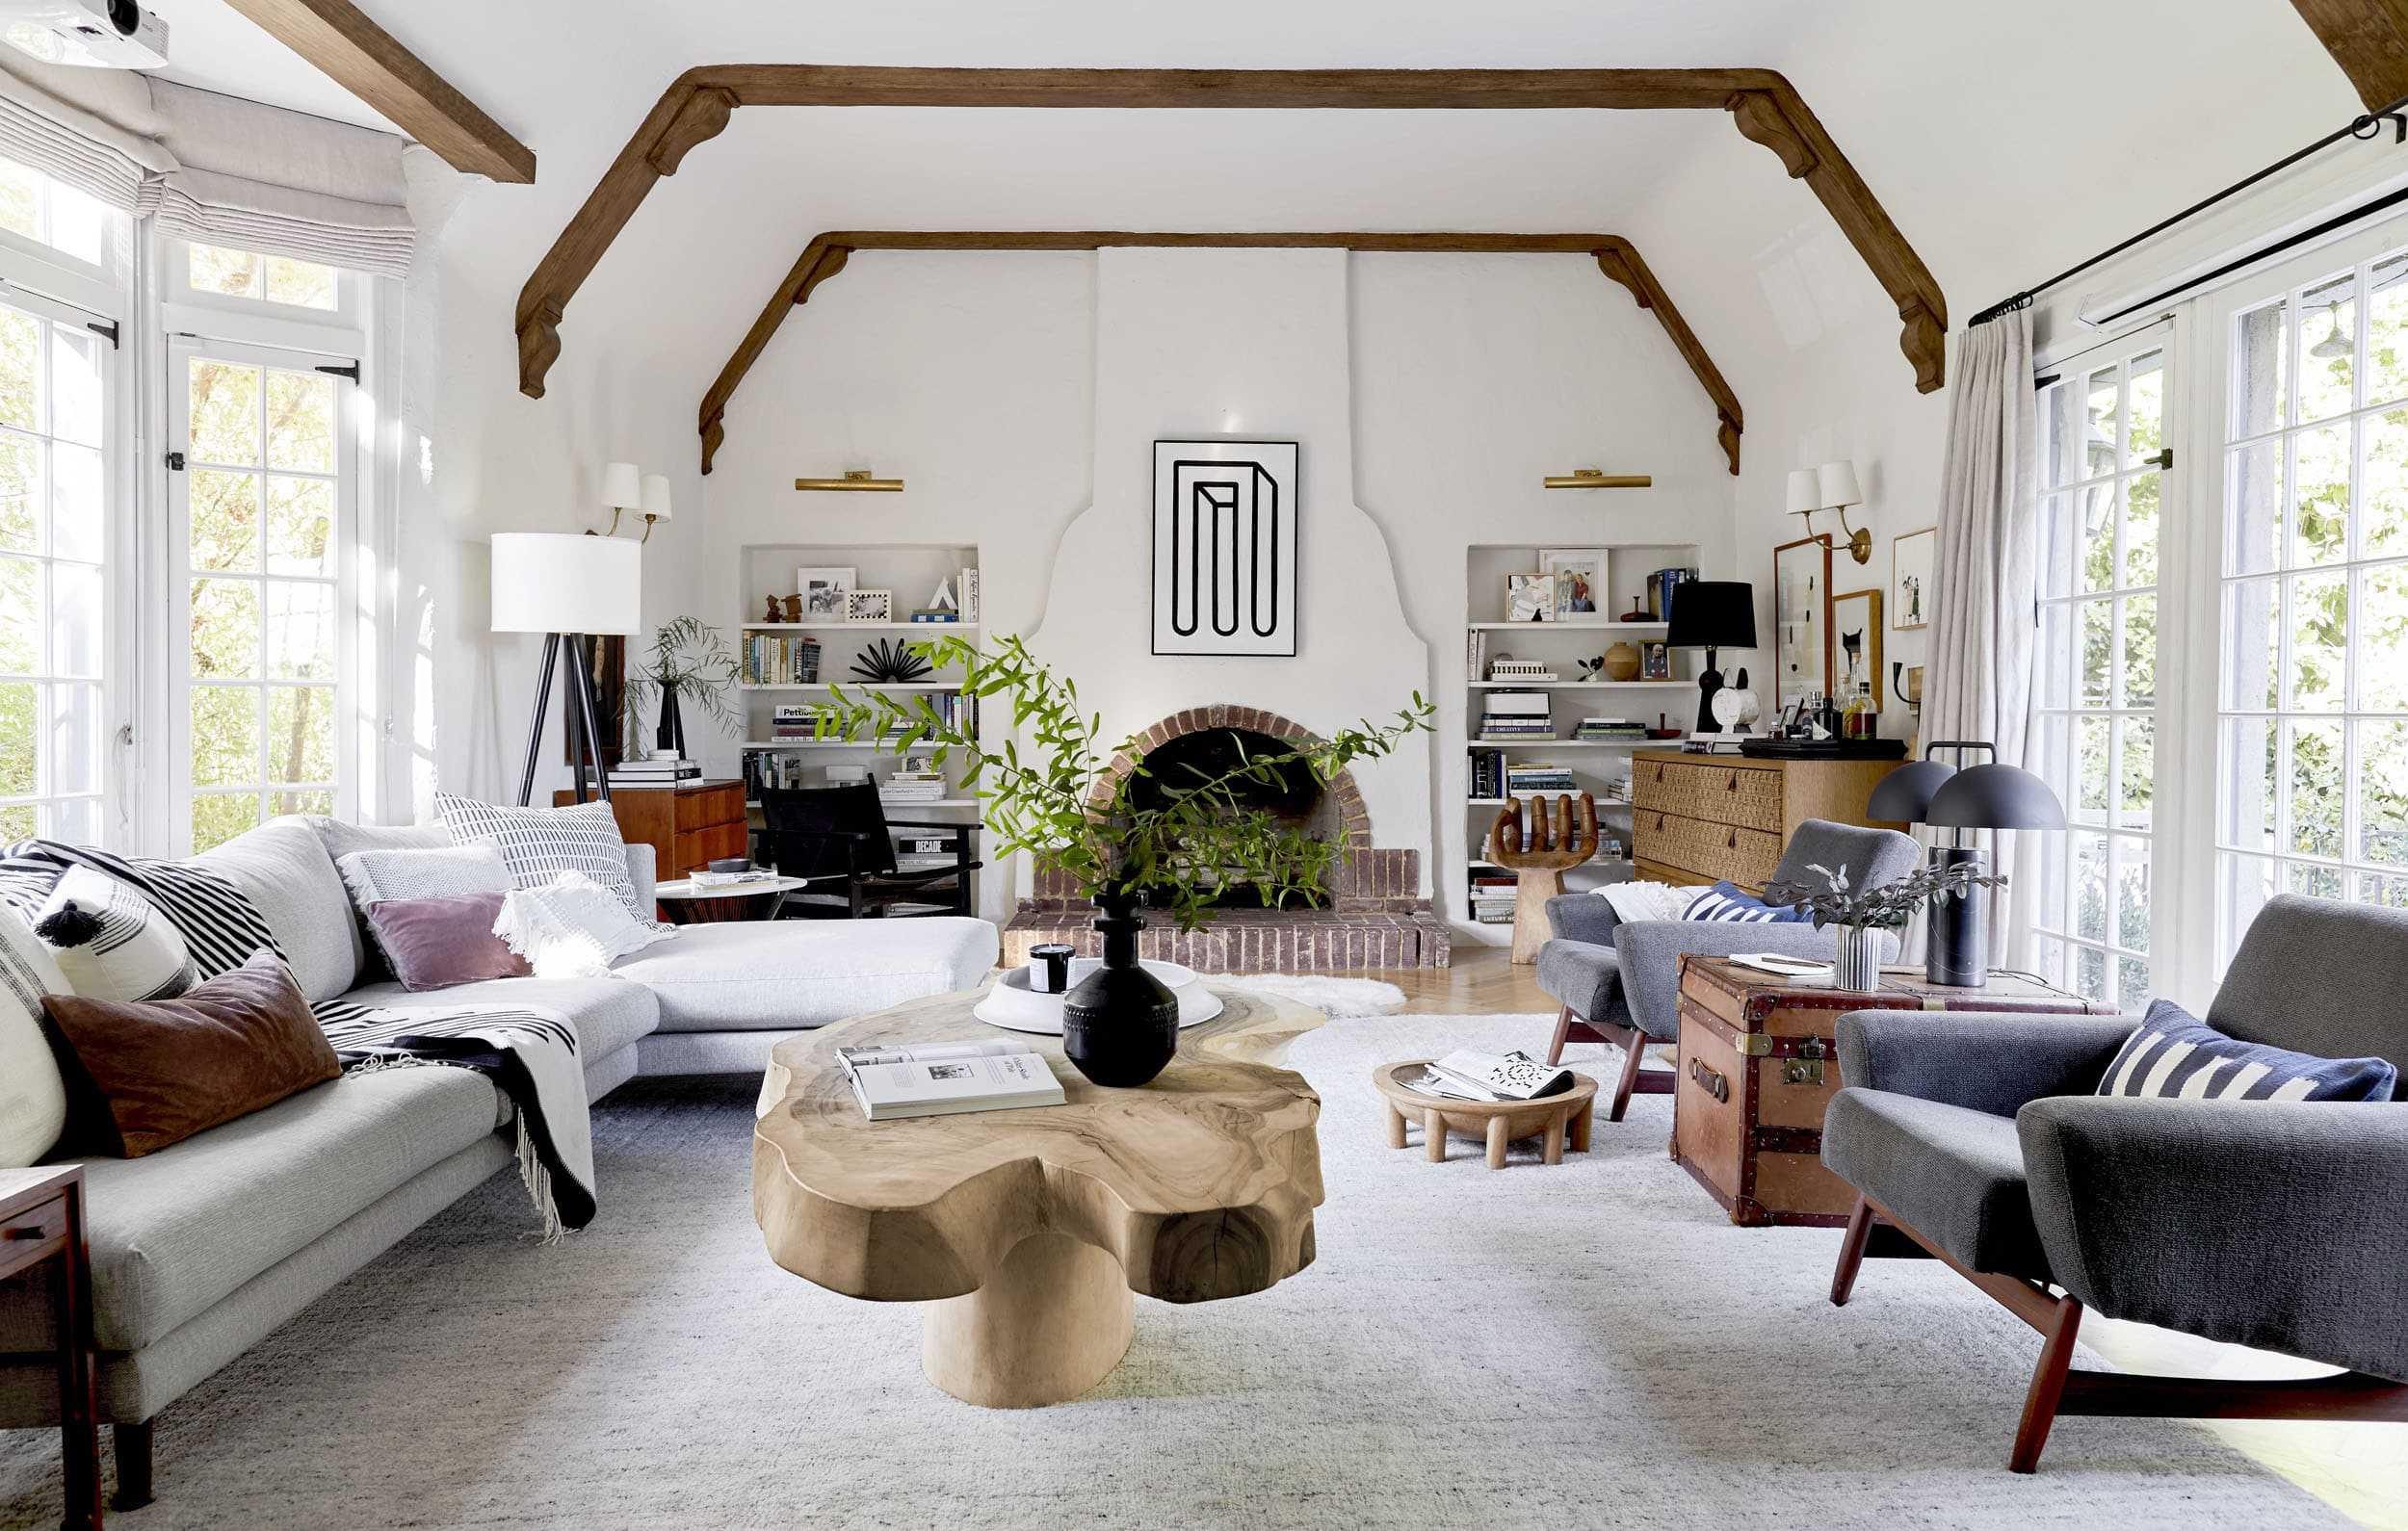 Interior Design Trends 2021: Top 4 Home Looks - TLC Interiors